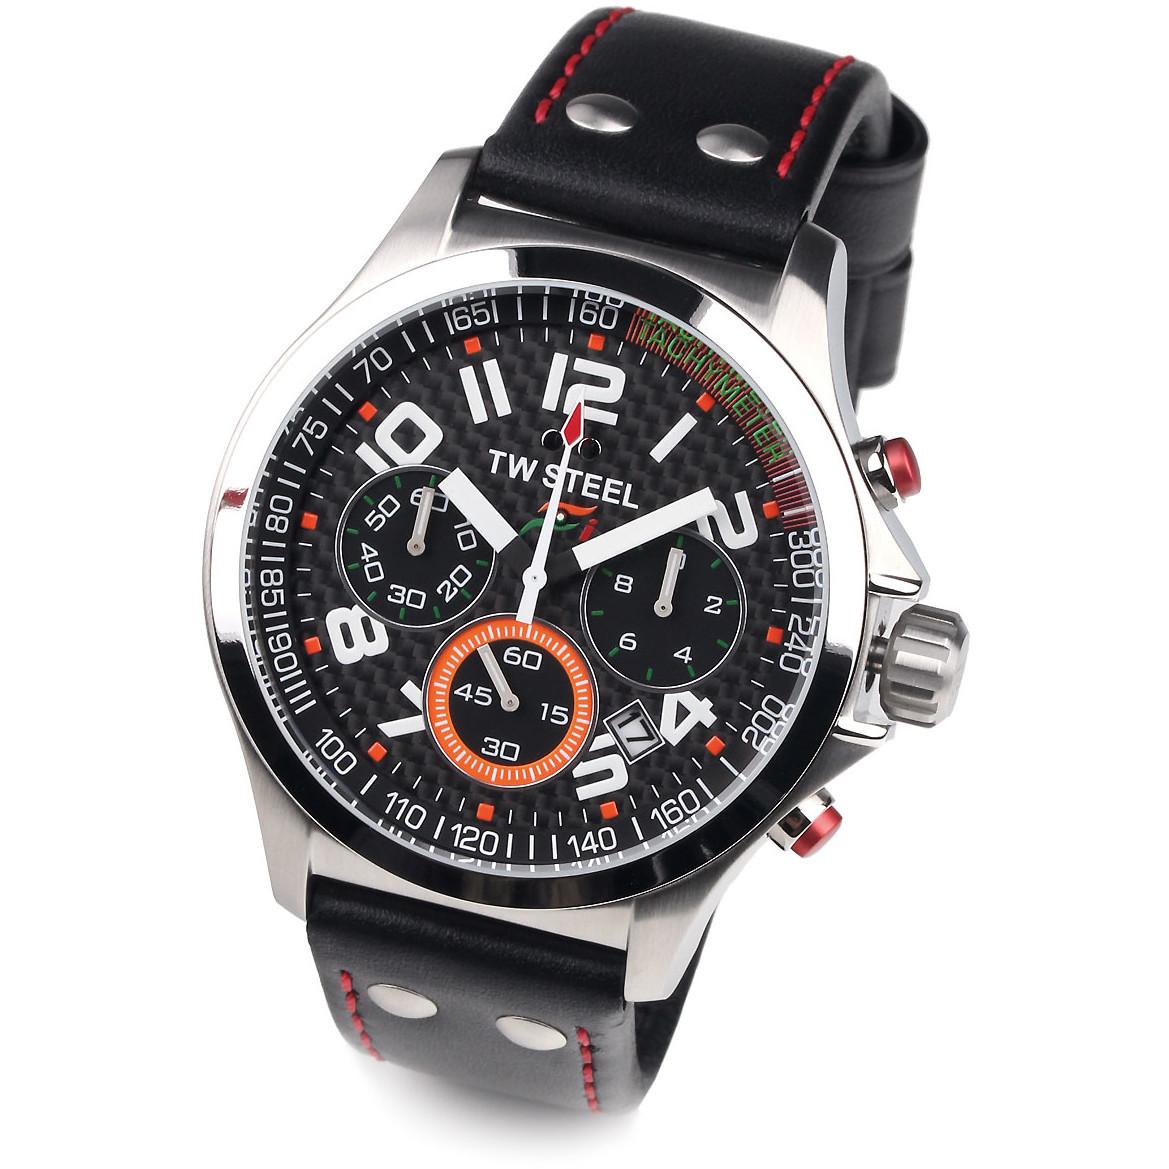 Ceas barbatesc TW-Steel TW432 Pilot Chronograph de mana original